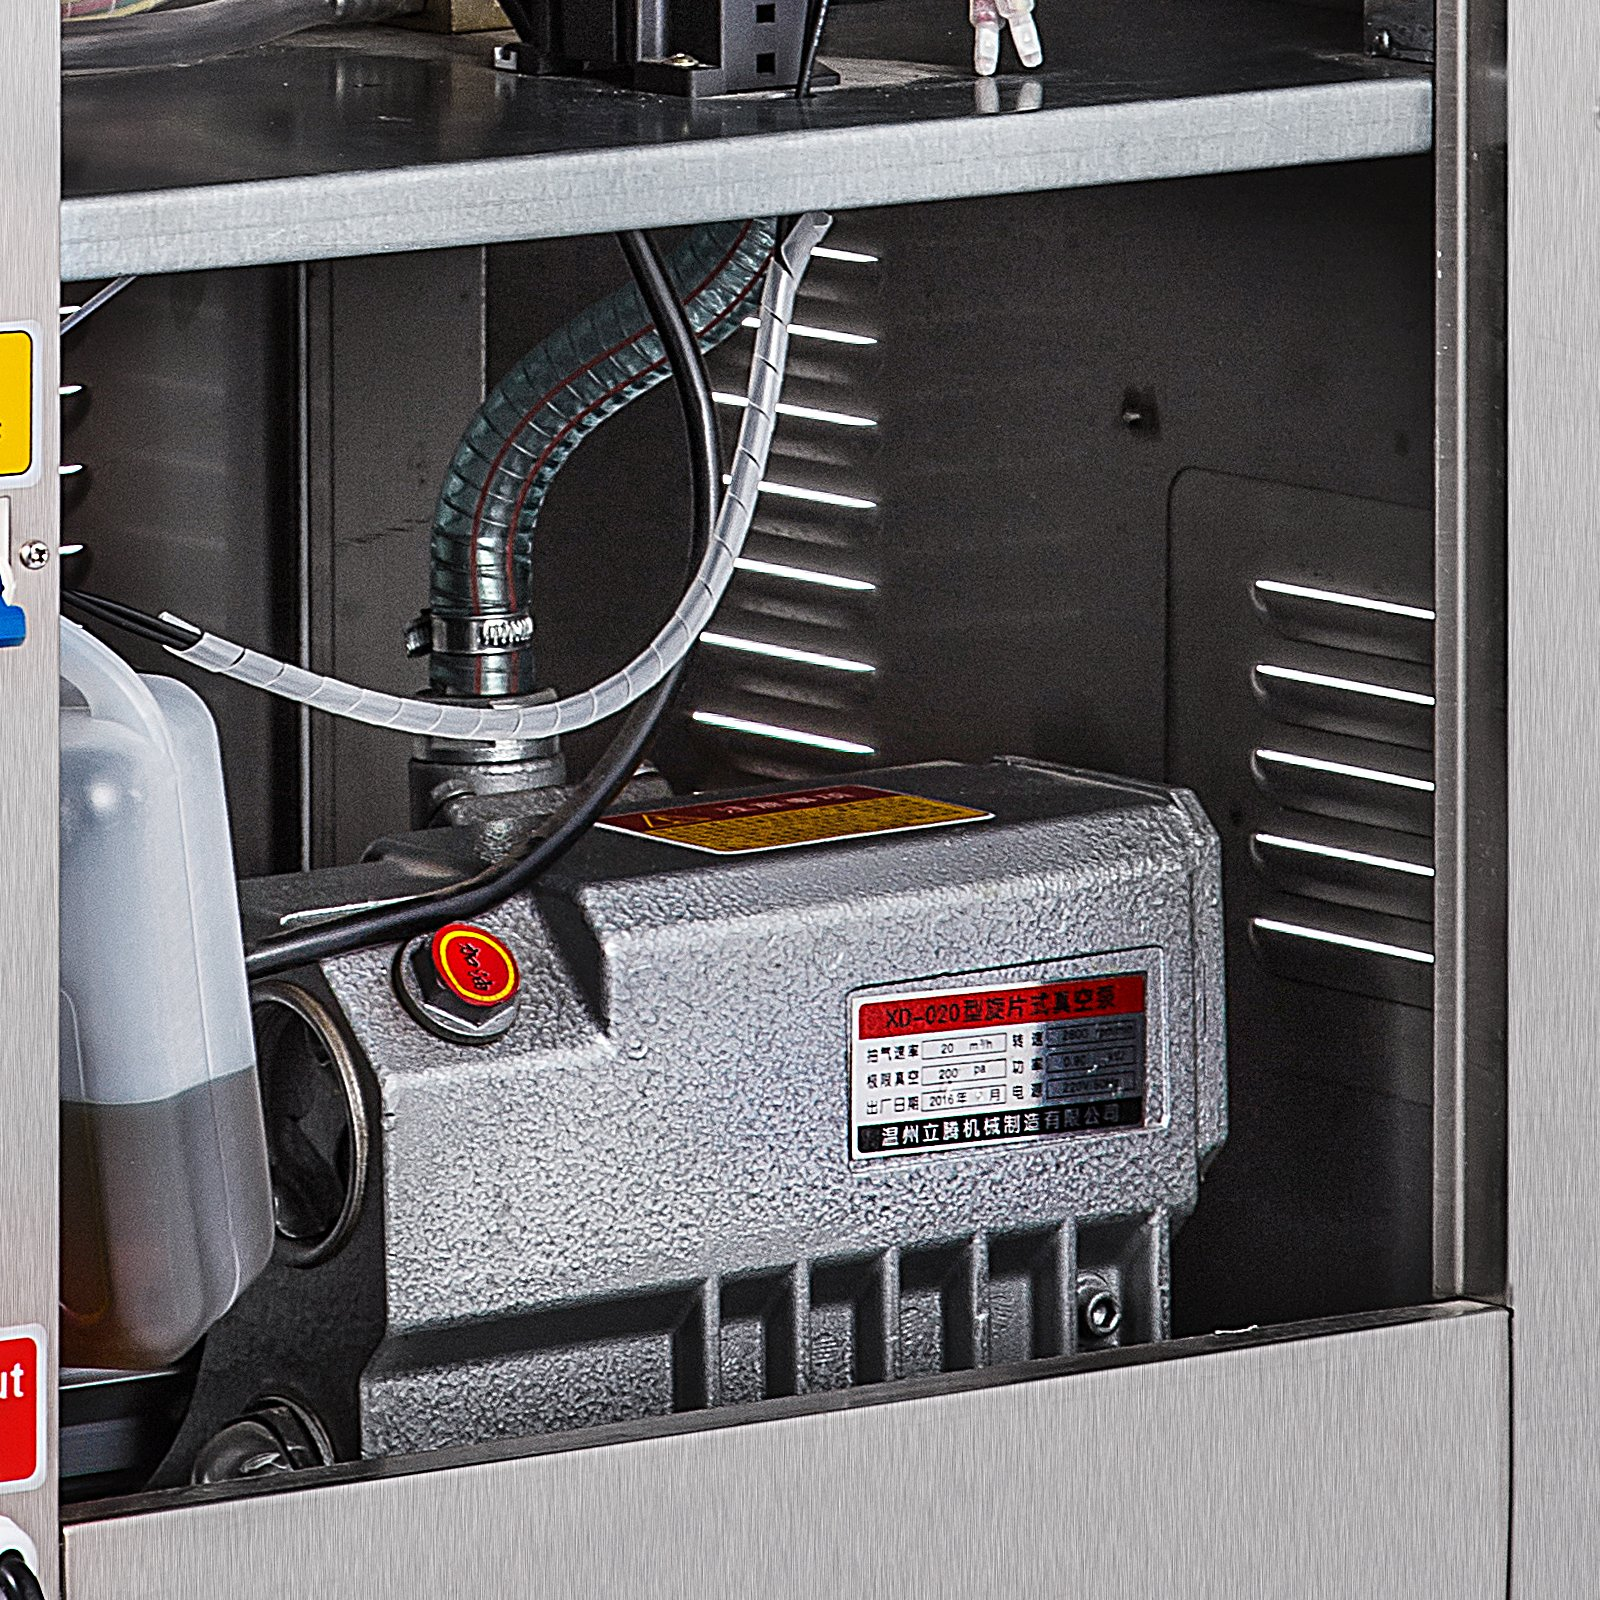 Happybuy DZ-400/2E Chamber Vacuum Sealer 1000W Vacuum Sealer Machine Automatic Vacuum Packing Sealing Sealer Machine for Home or Commercial Use (DZ-400/2E) by Happybuy (Image #9)